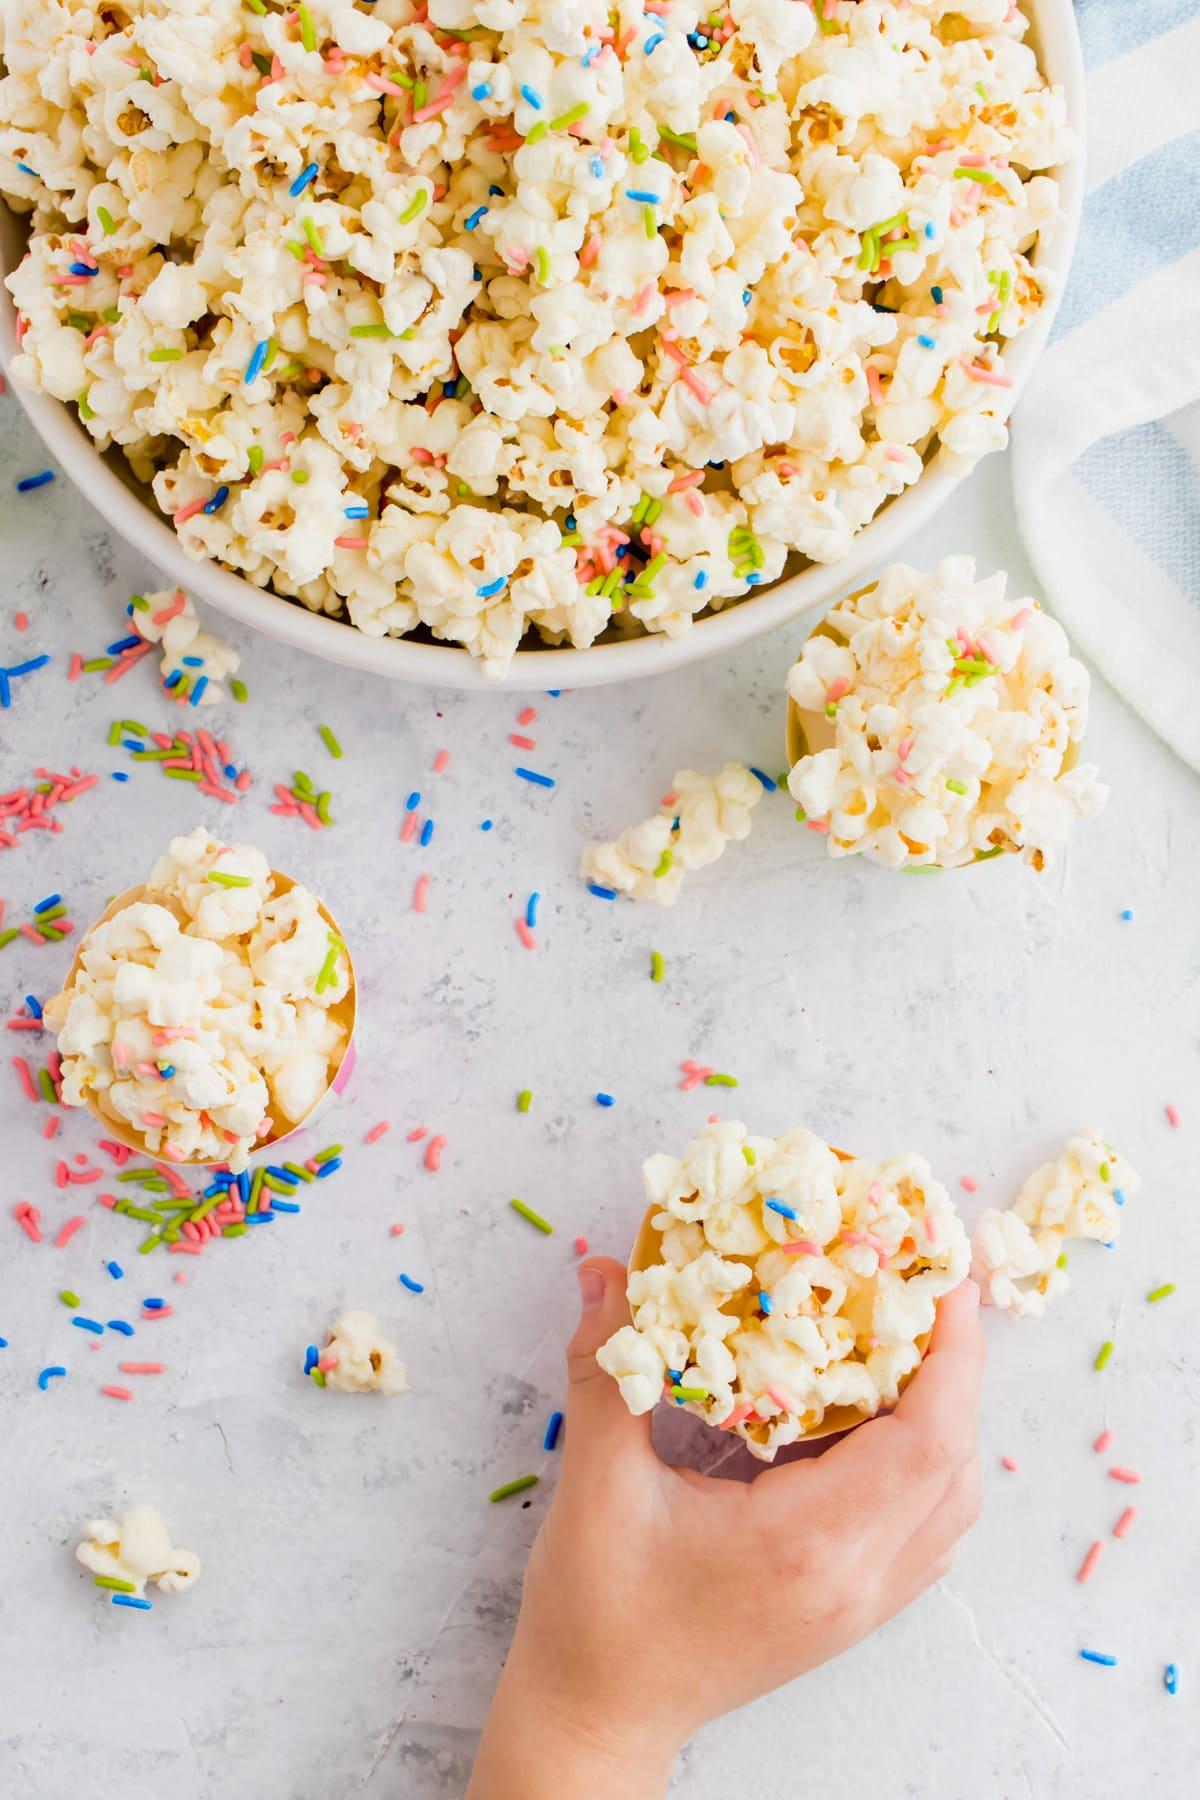 fun white chocolate funfetti popcorn by top Houston lifesyle blogger Ashley Rose of Sugar and Cloth #recipes #entertaining #idea